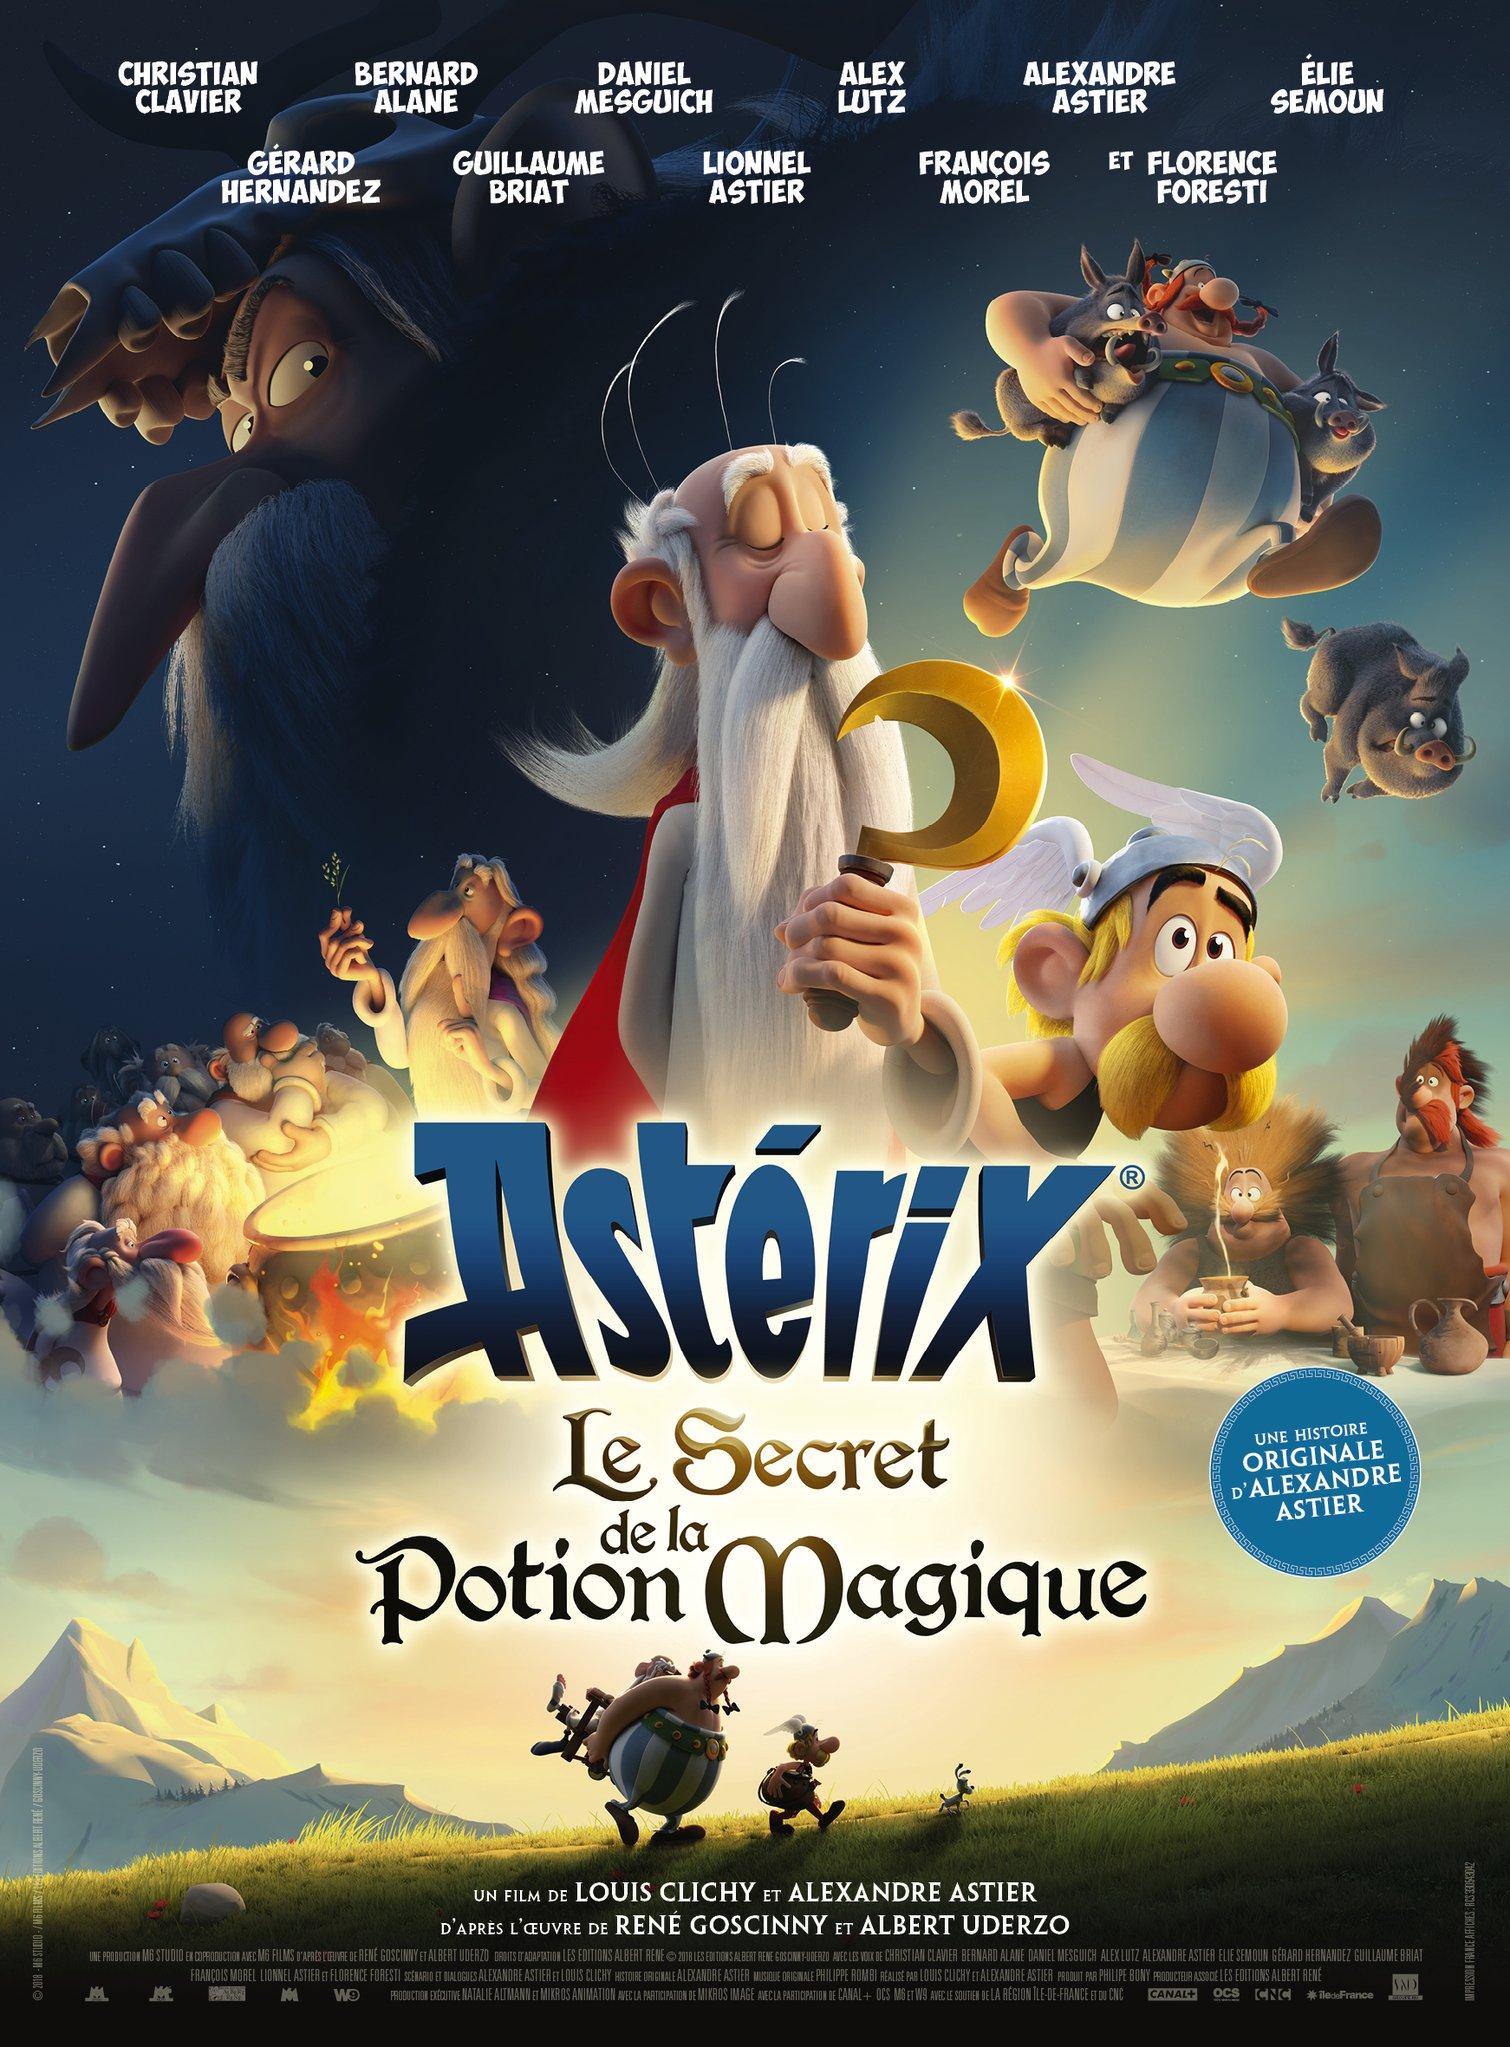 Asterix Potion Magique Poster